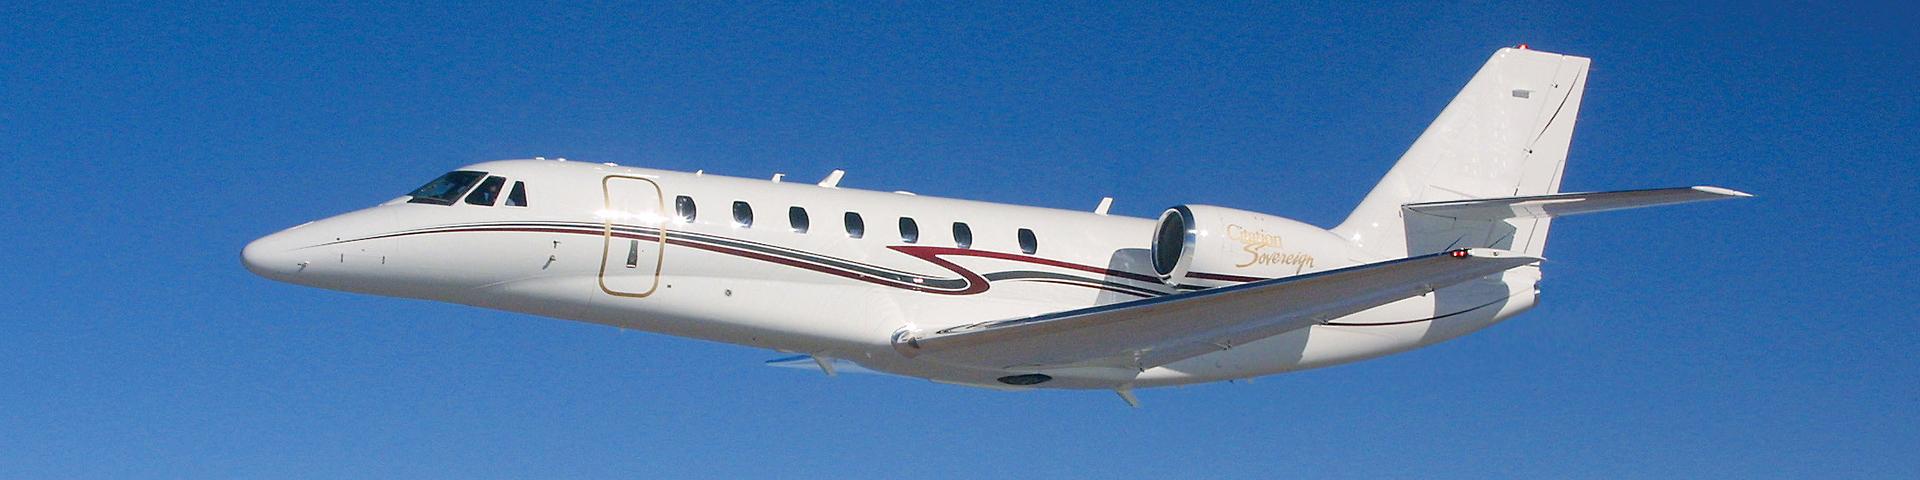 Cessna Citation Sovereign11 - Citation Sovereign Private Jet